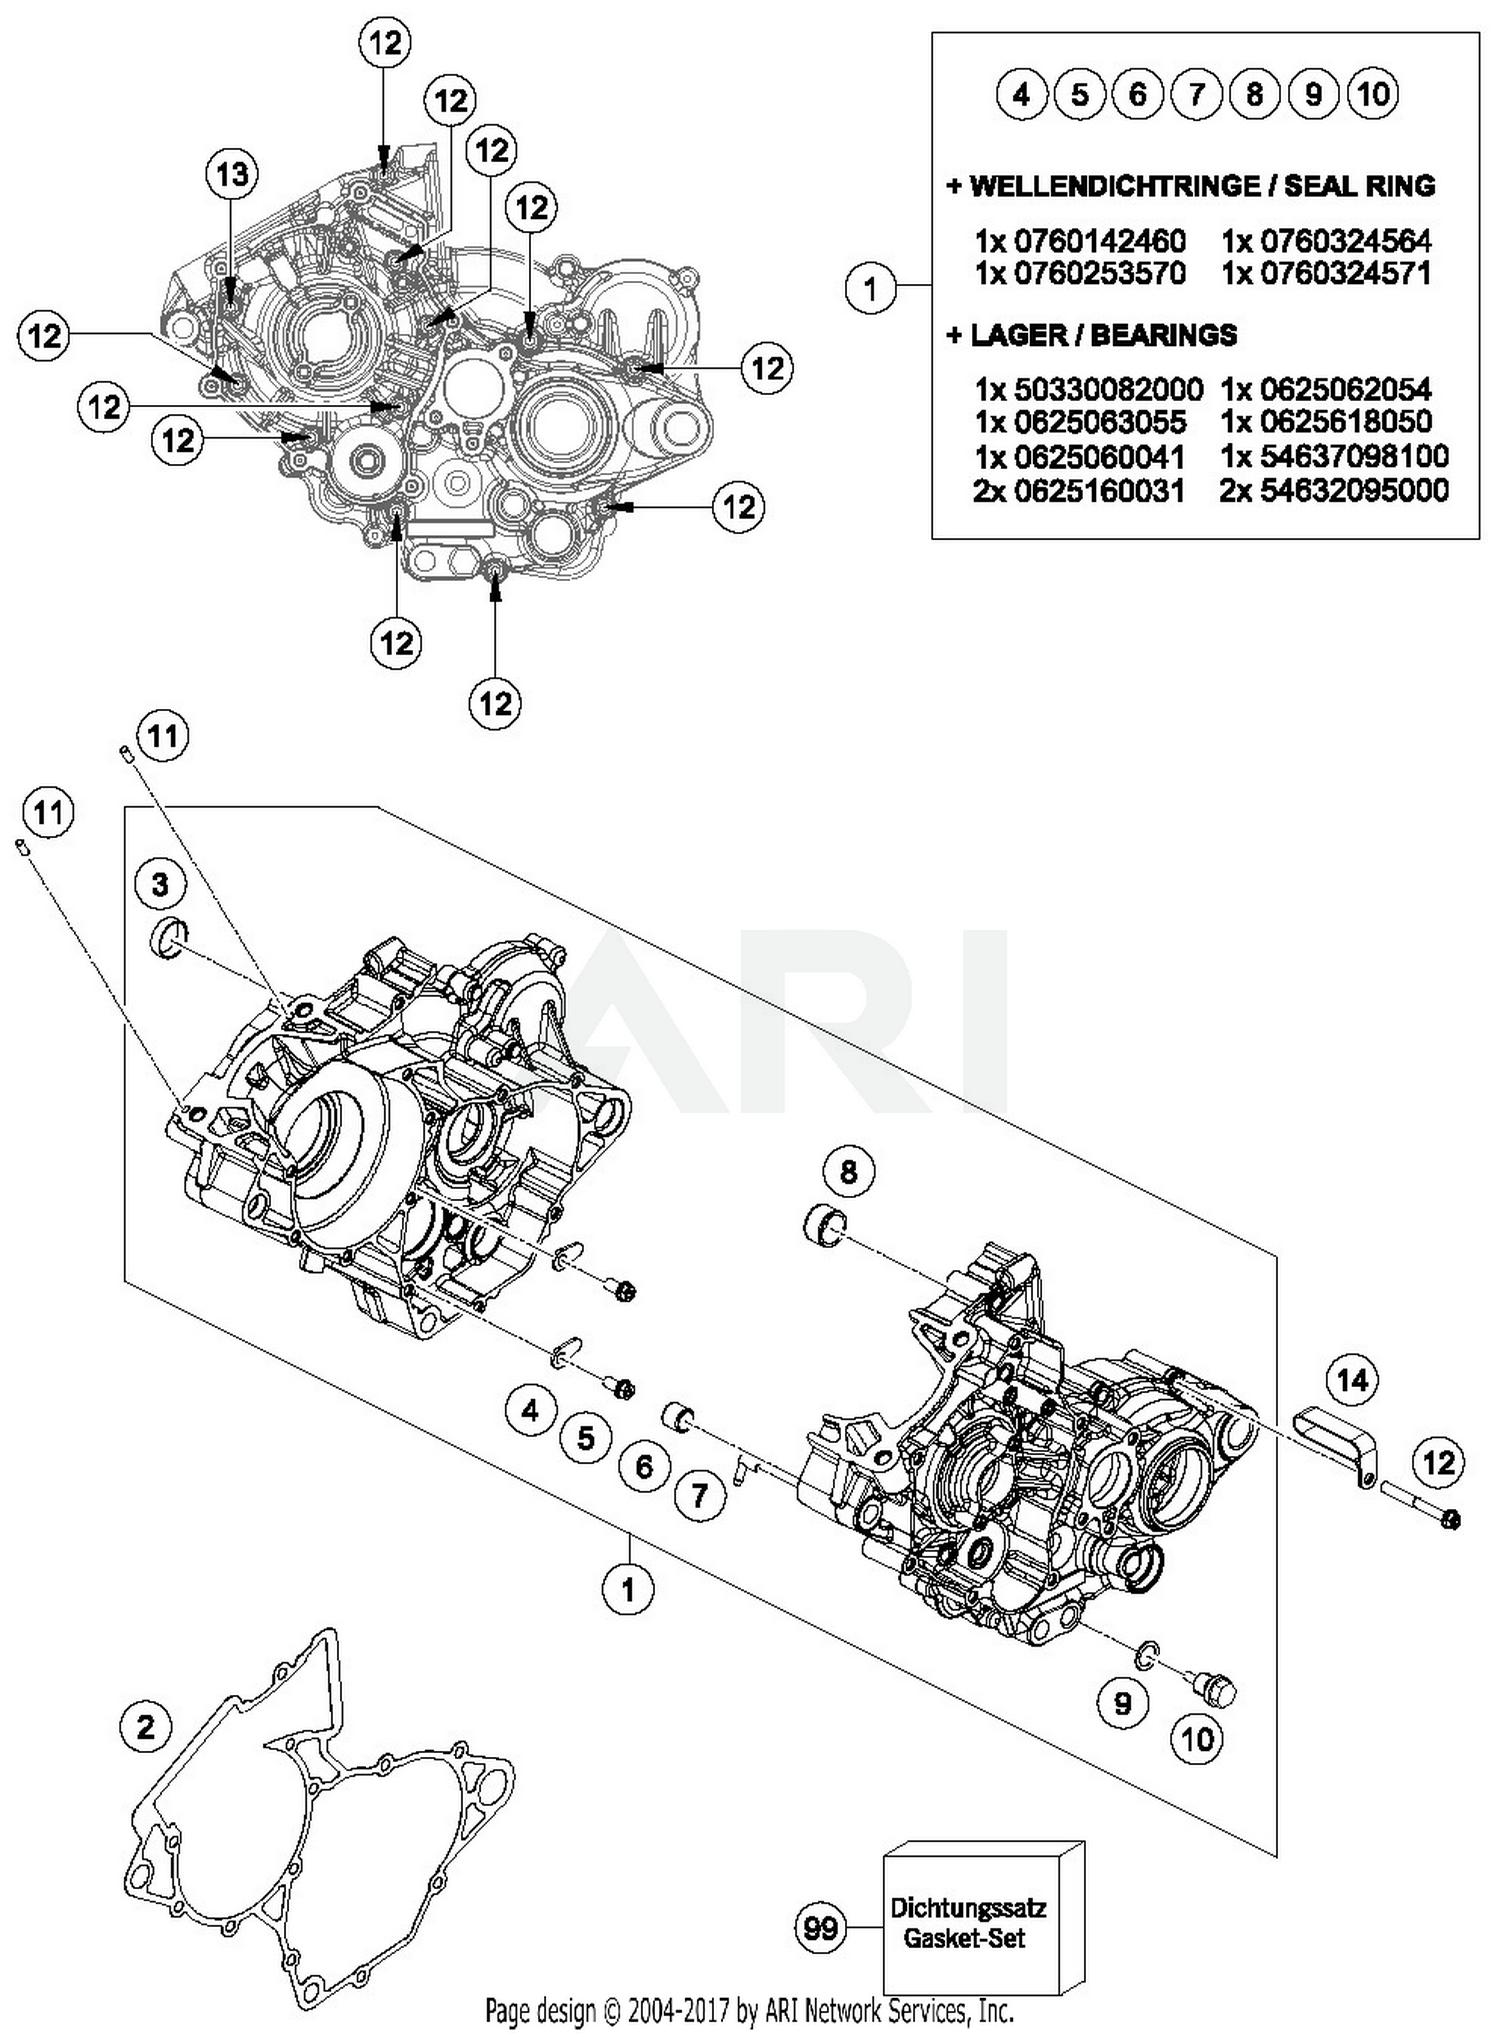 Ktm 350 Engine Diagram Wiring Diagram Wiper B Wiper B Bujinkan It